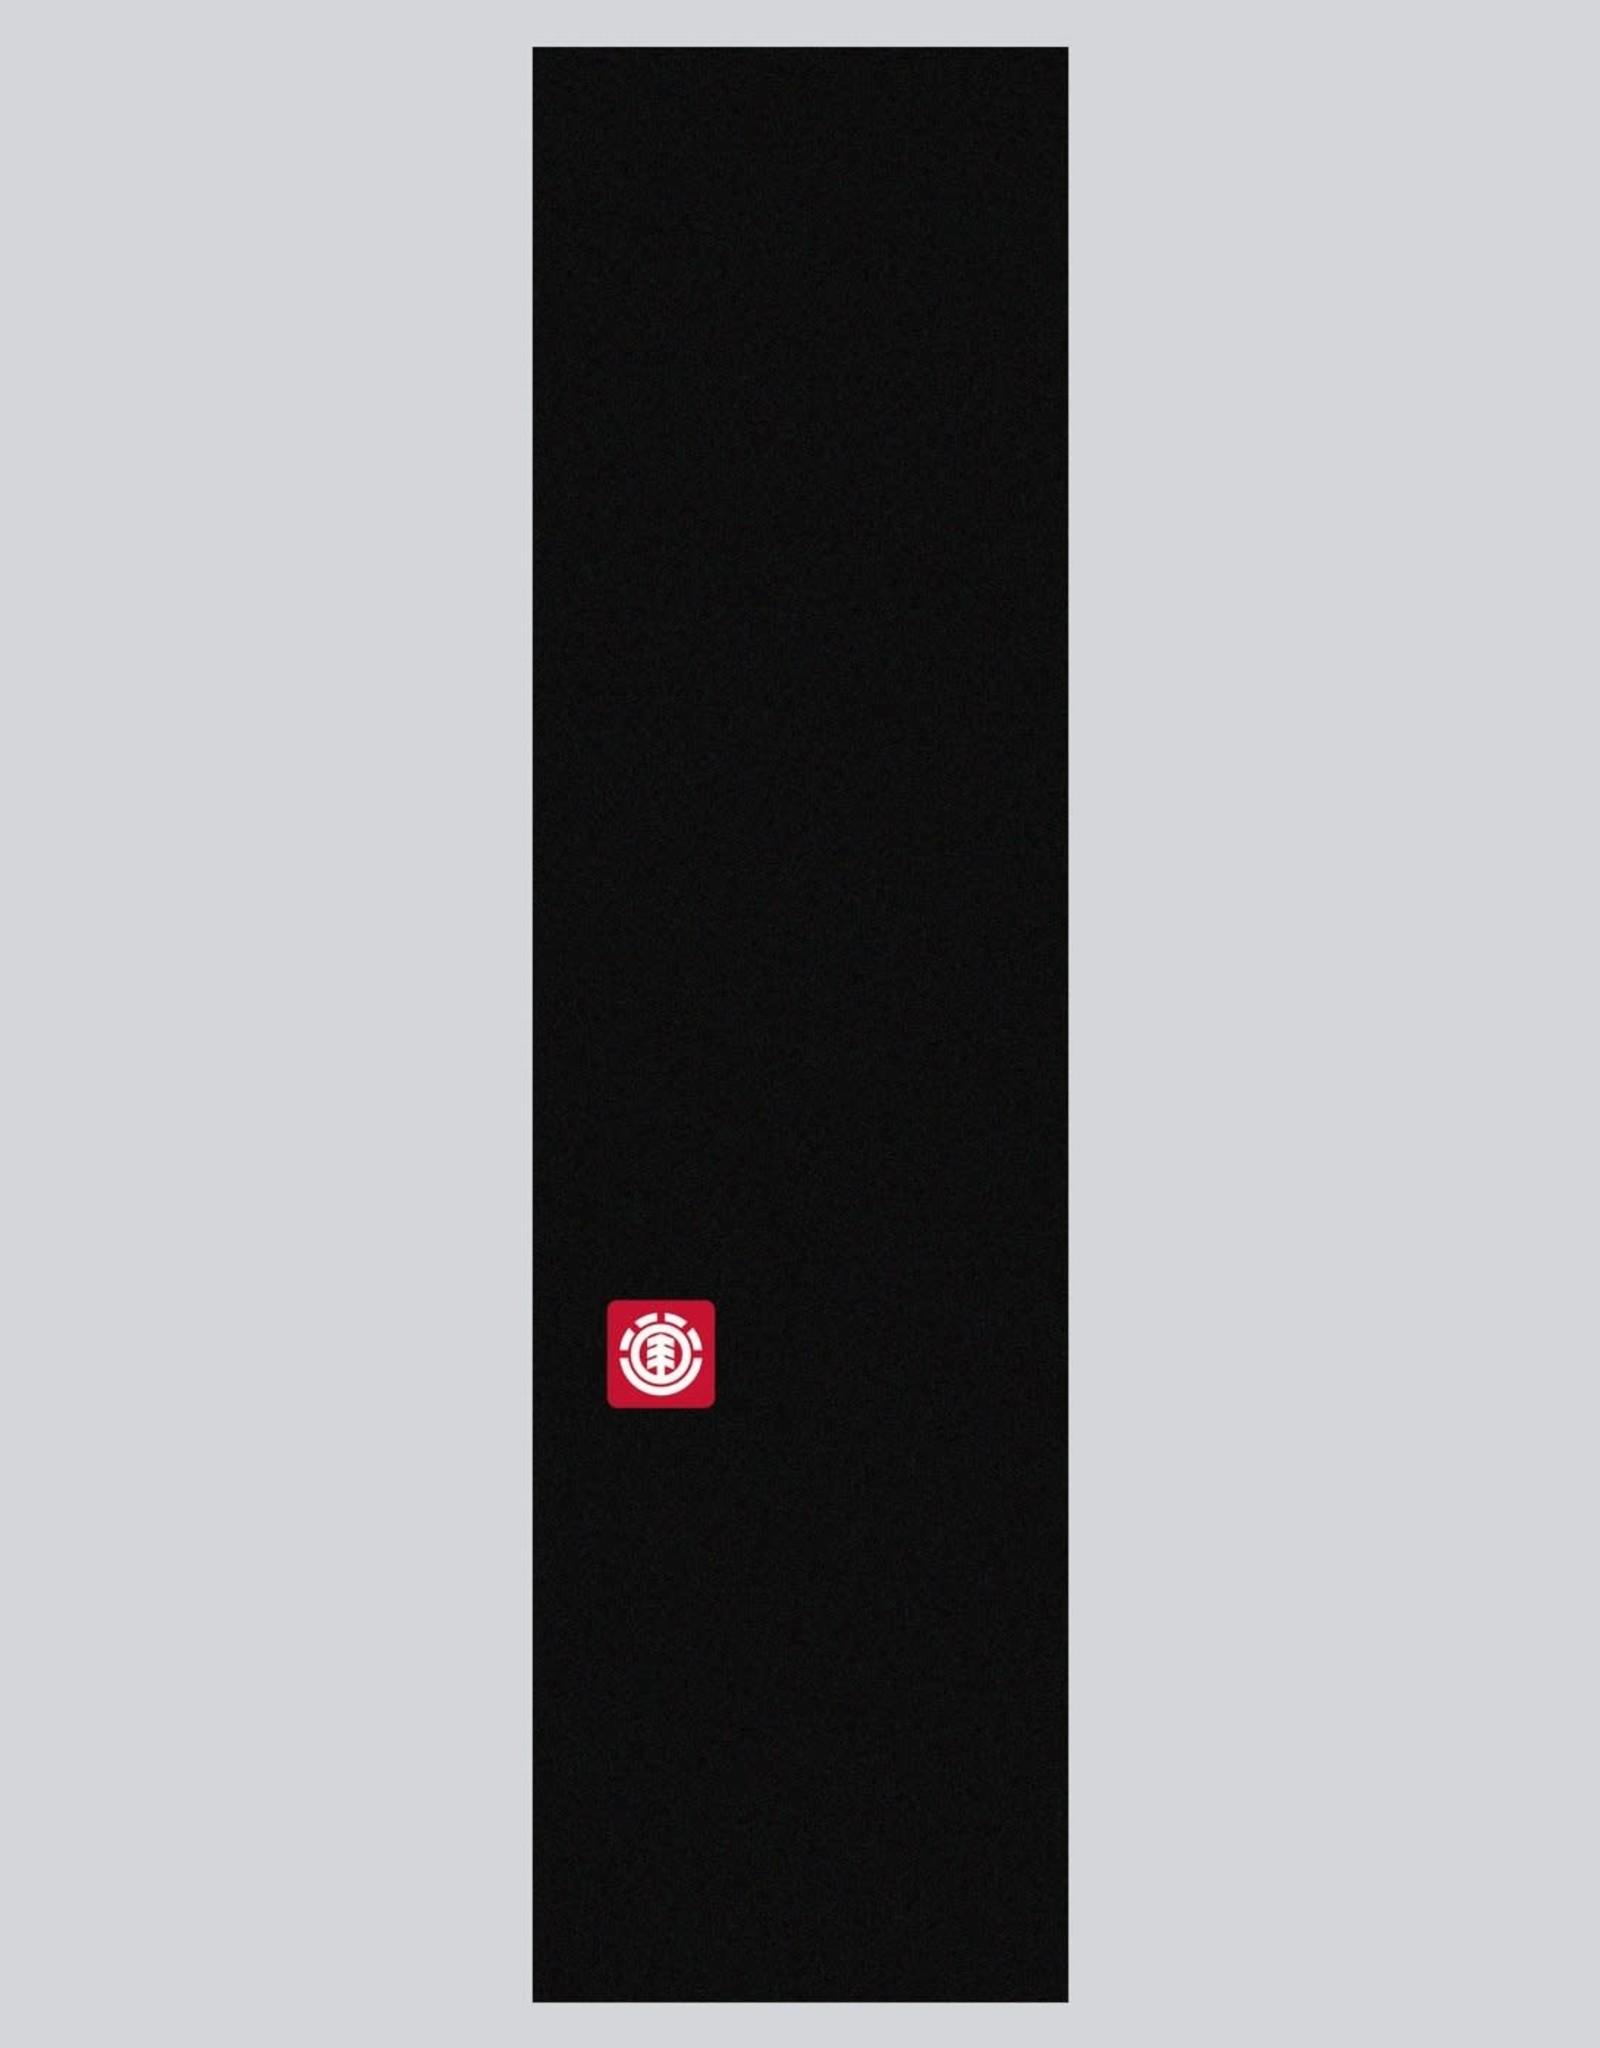 ELEMENT ELEMENT GRIP SHEET SQUARE ICON BLACK